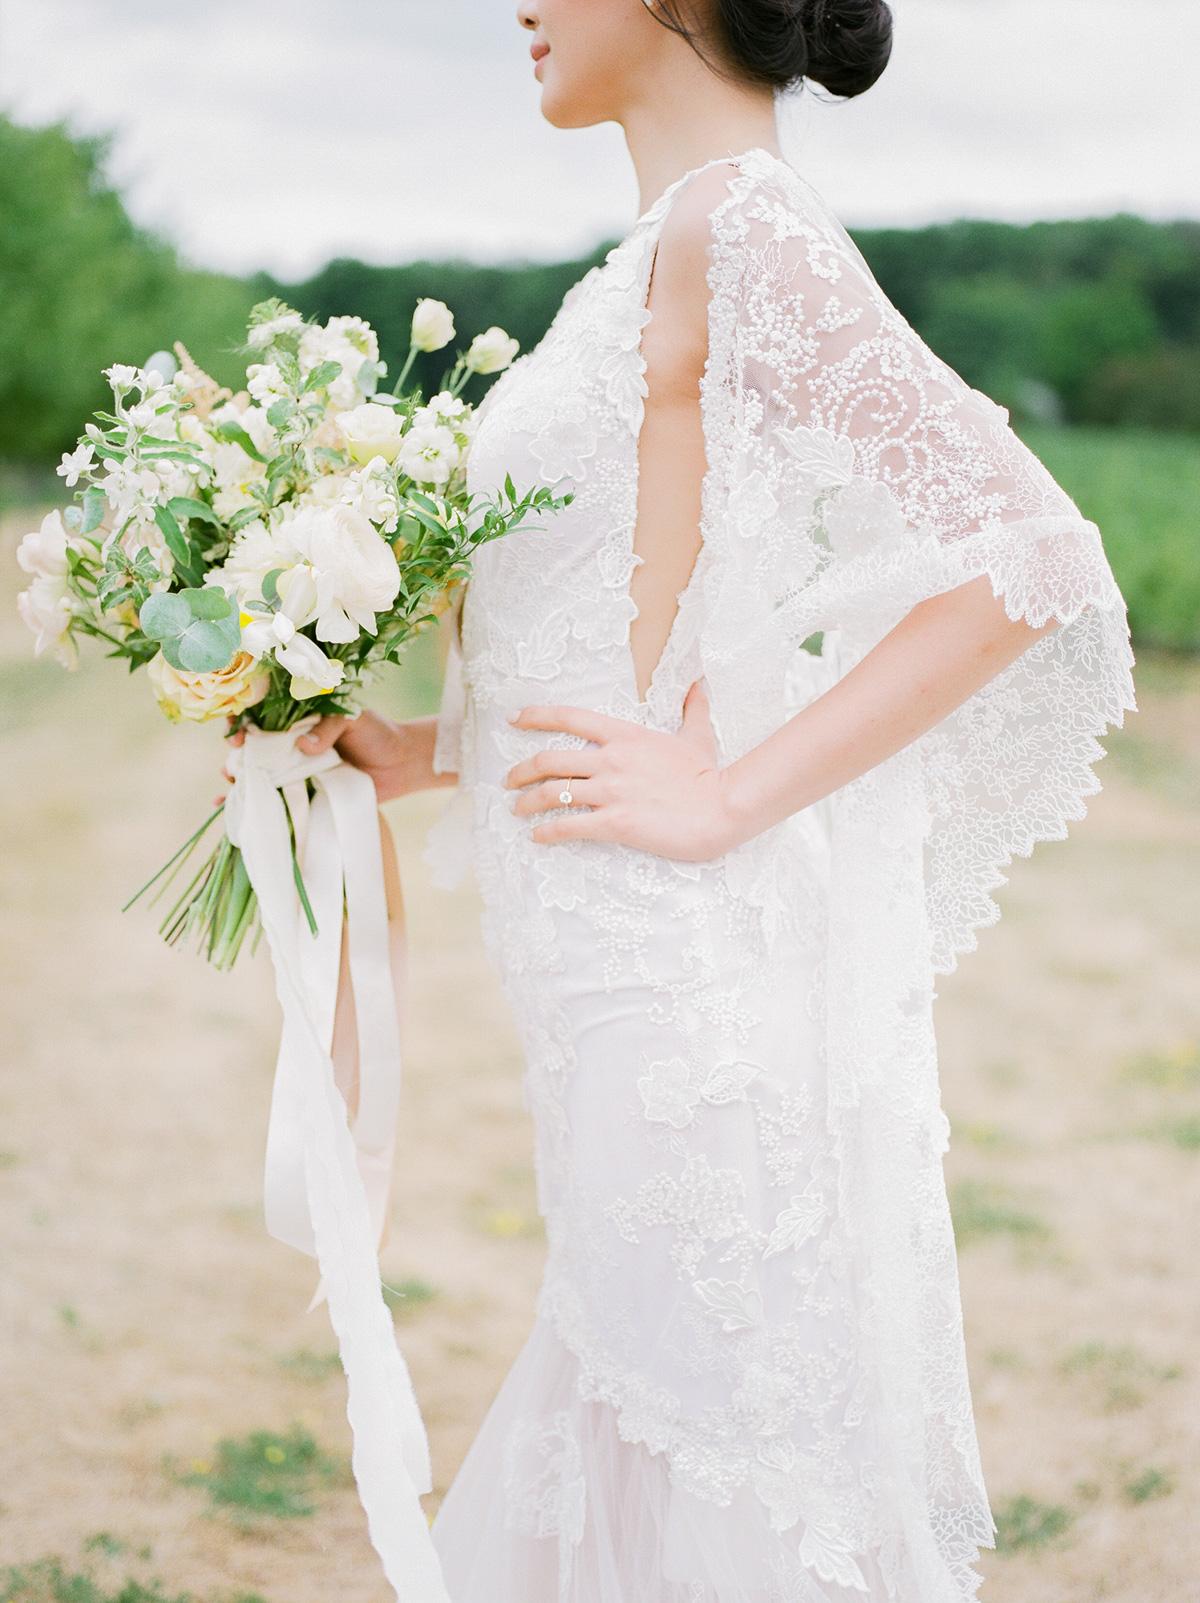 jennifer-xu-photography-vineyard-bride-swish-list-rosewod-eatstes-winery-beamsville-wedding-editorial-7.jpg